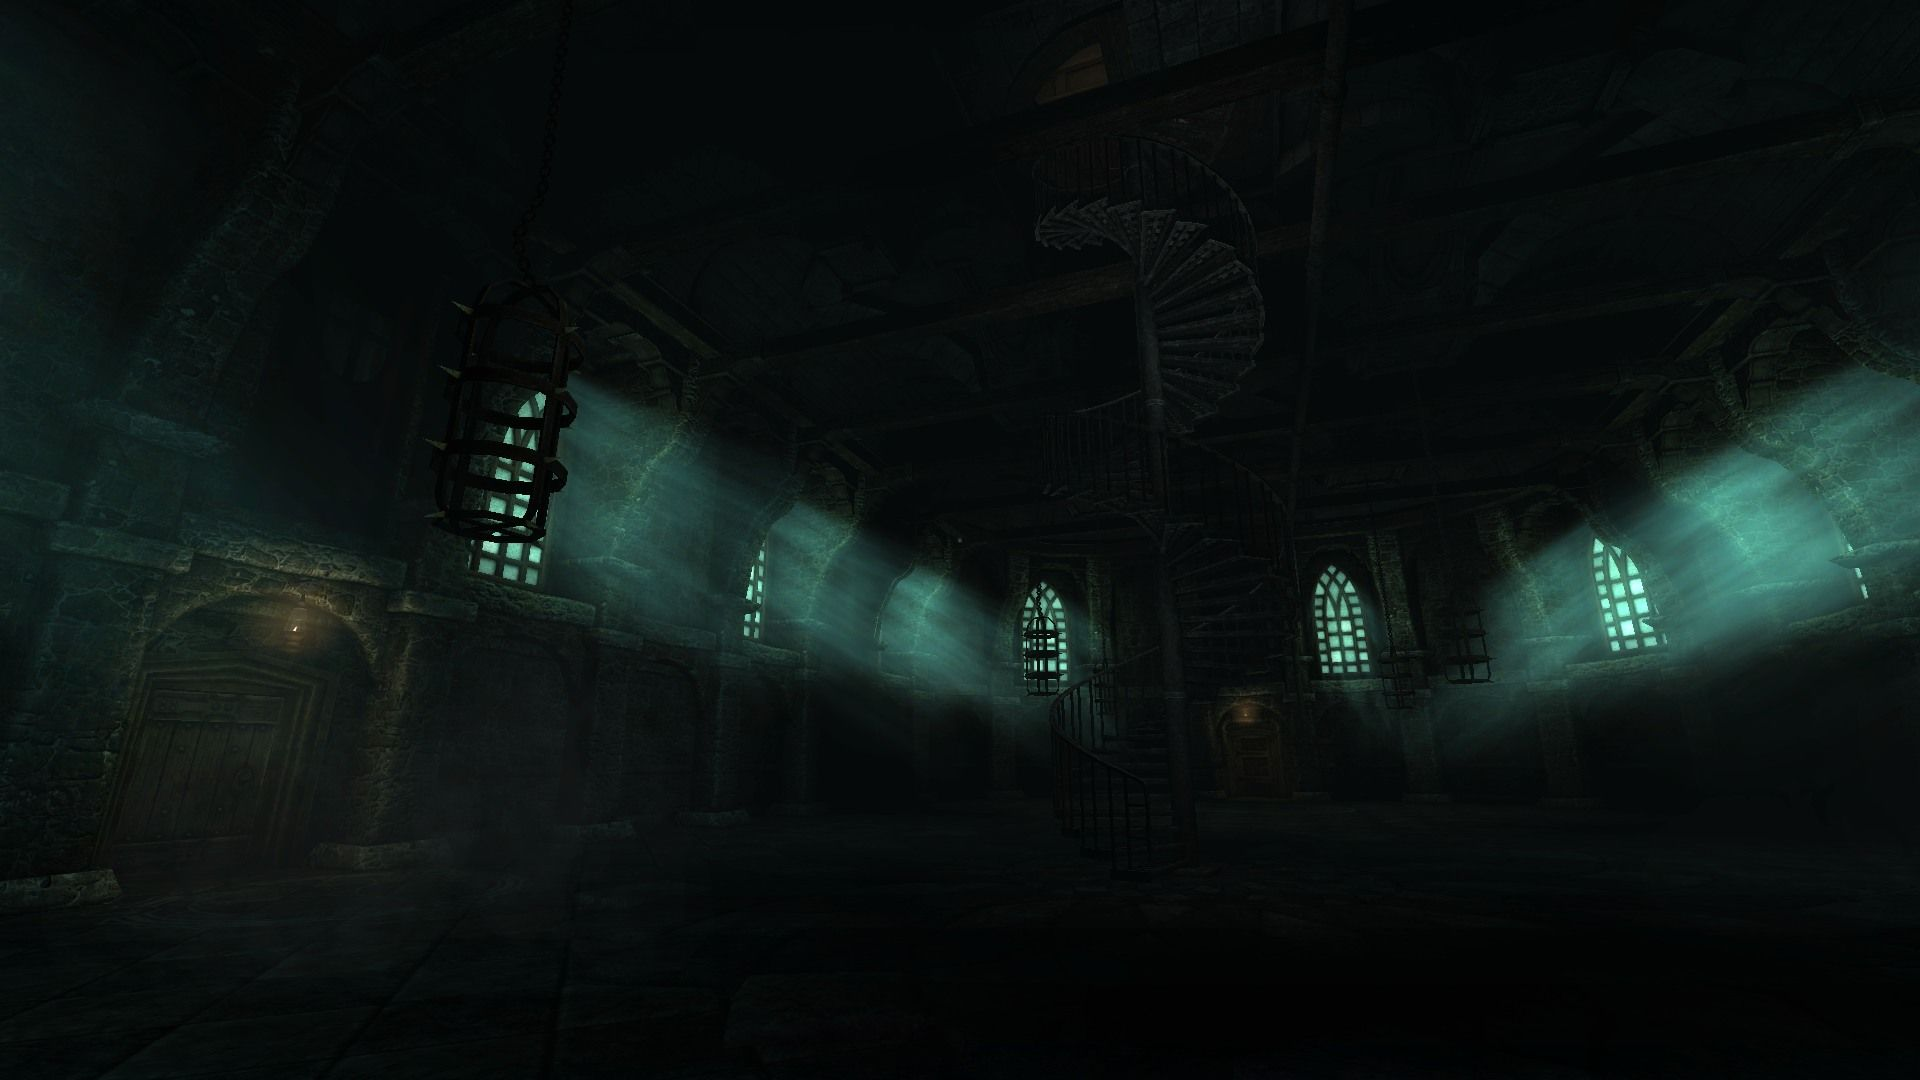 Image 6 Amnesia Troubled Past Mod For Amnesia The Dark Descent